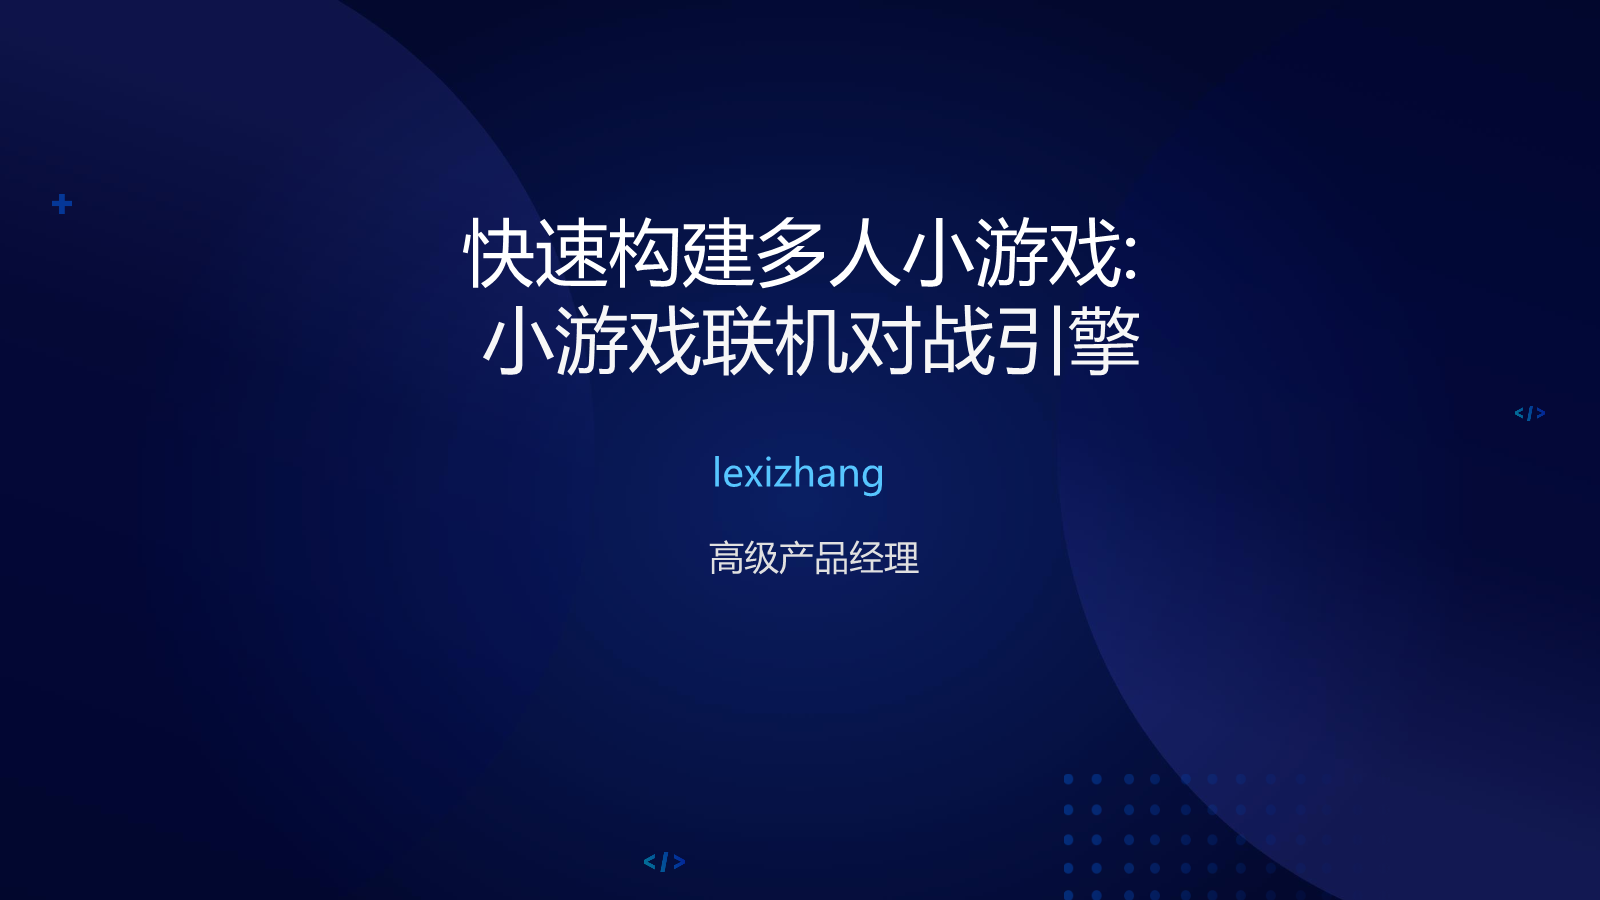 lexizhang-快速构建多人小游戏:小游戏联机对战引擎